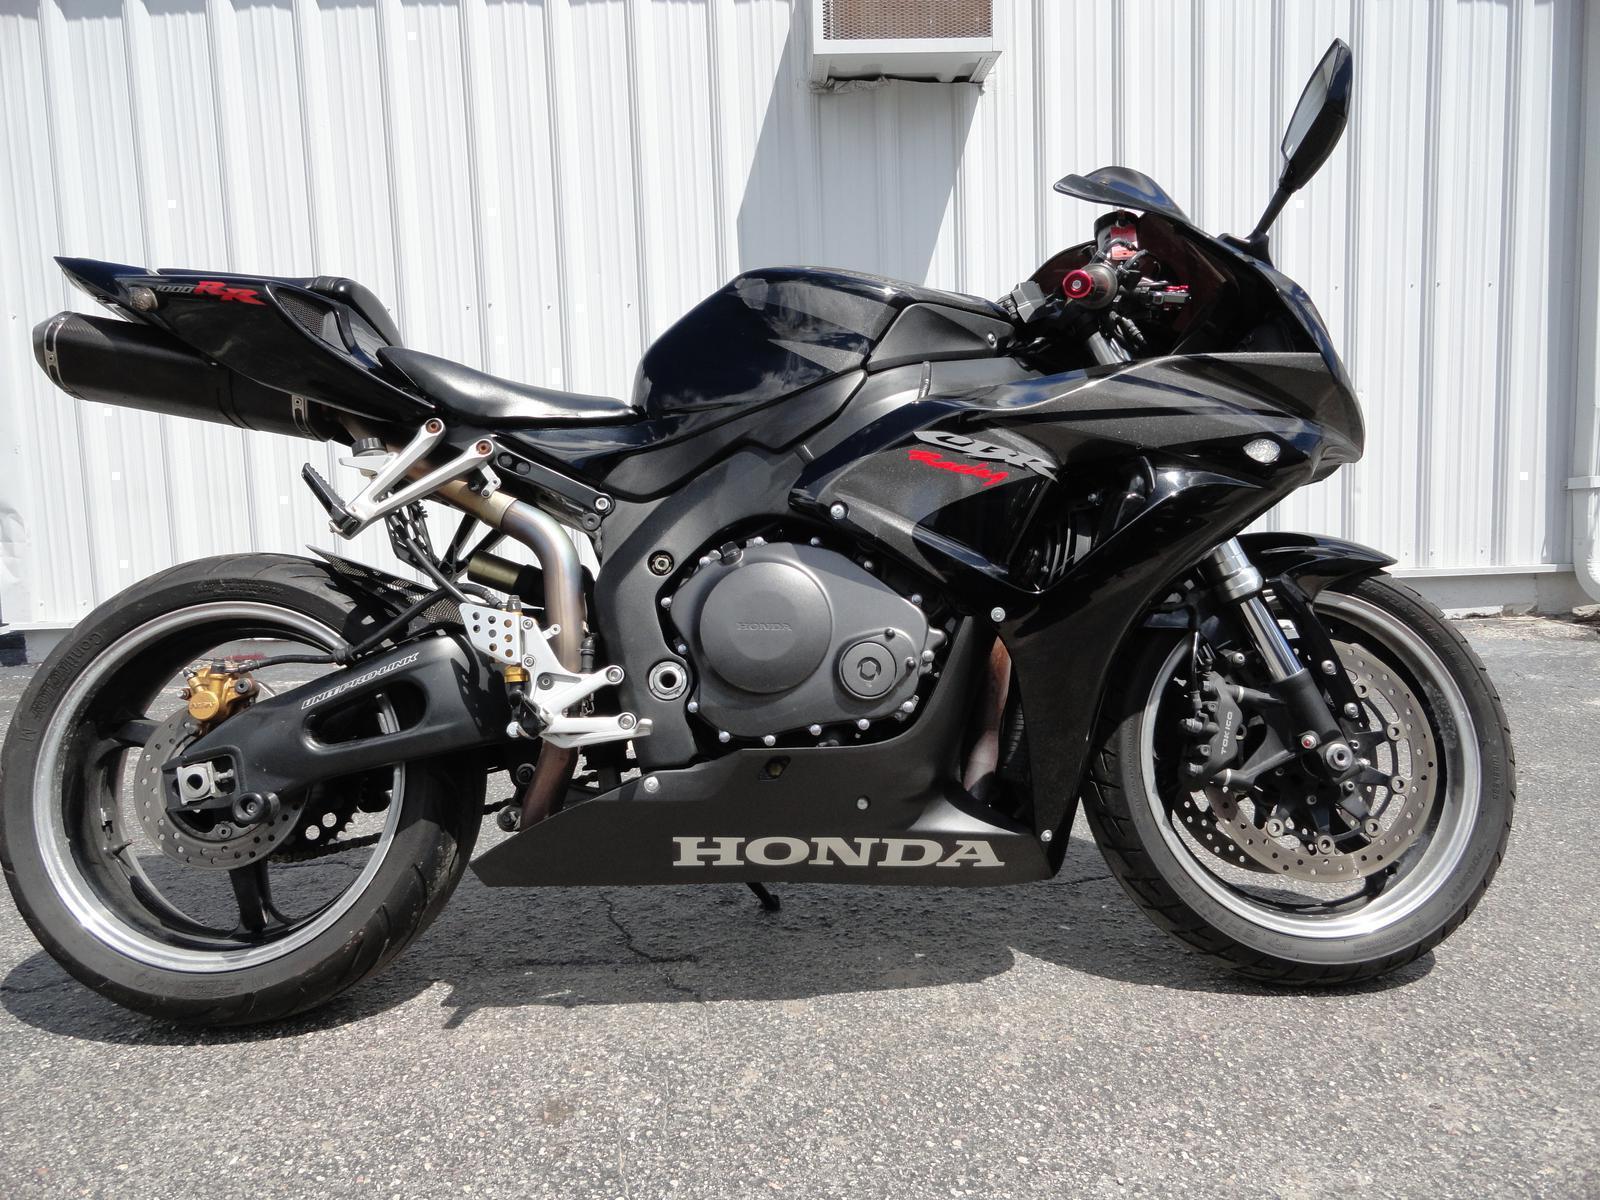 2007 Honda CBR1000RR for sale in Longwood, FL   Prime Motorcycles ...